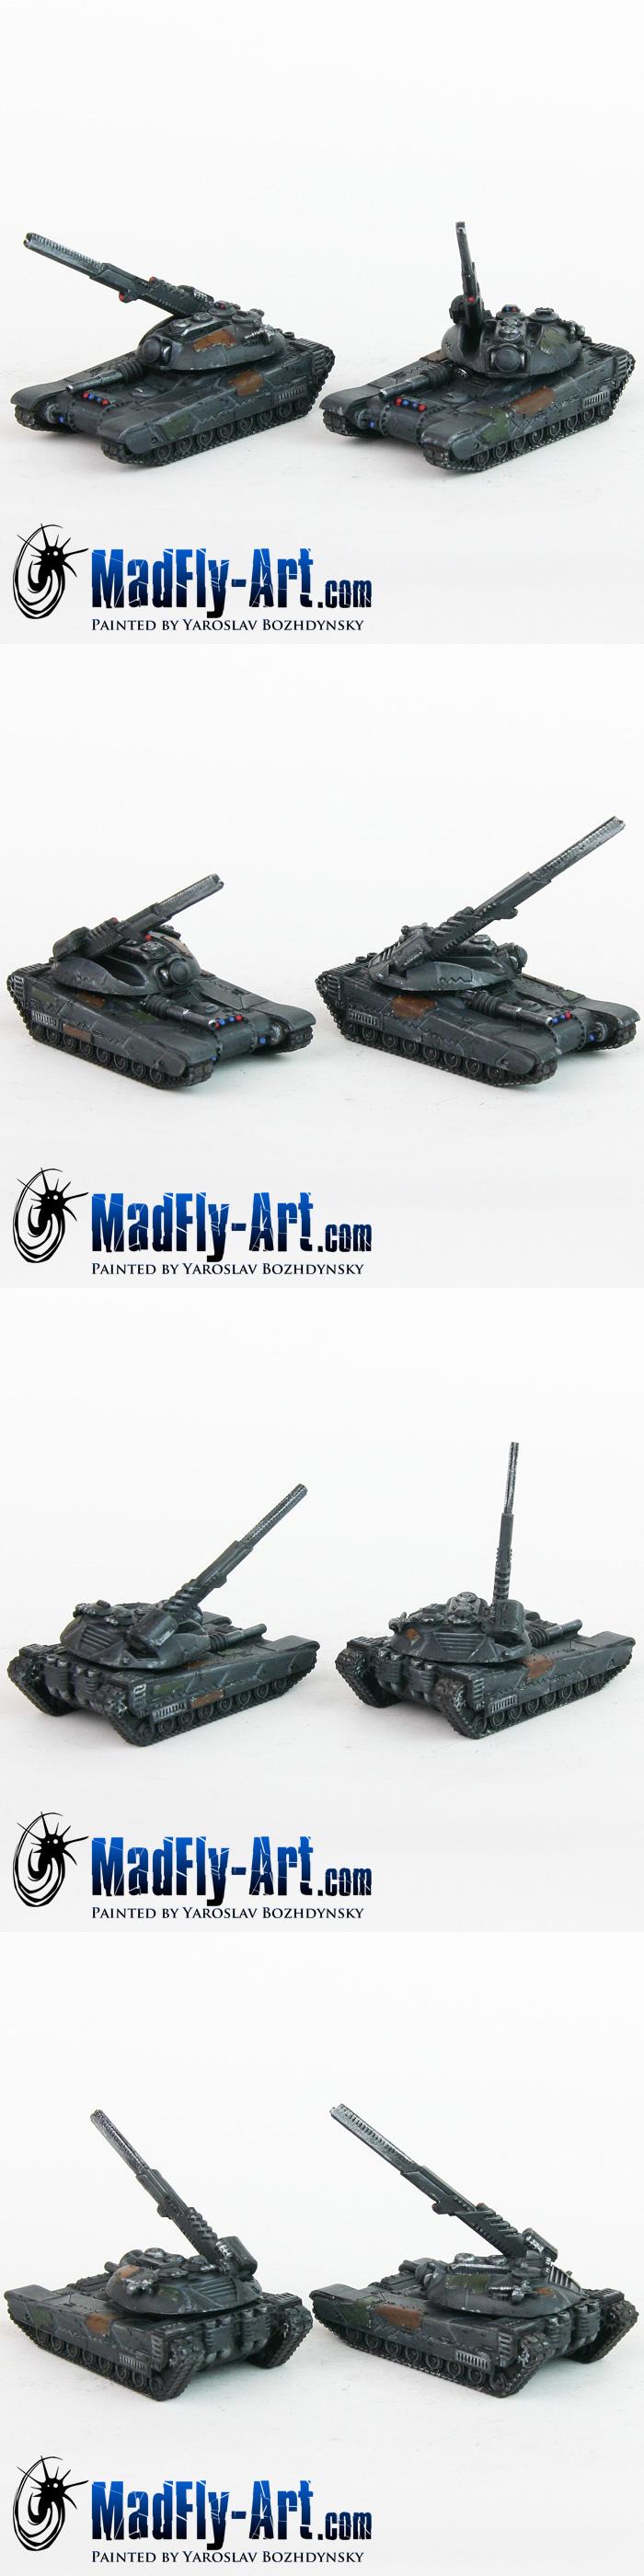 M20 Zhukov Tanks